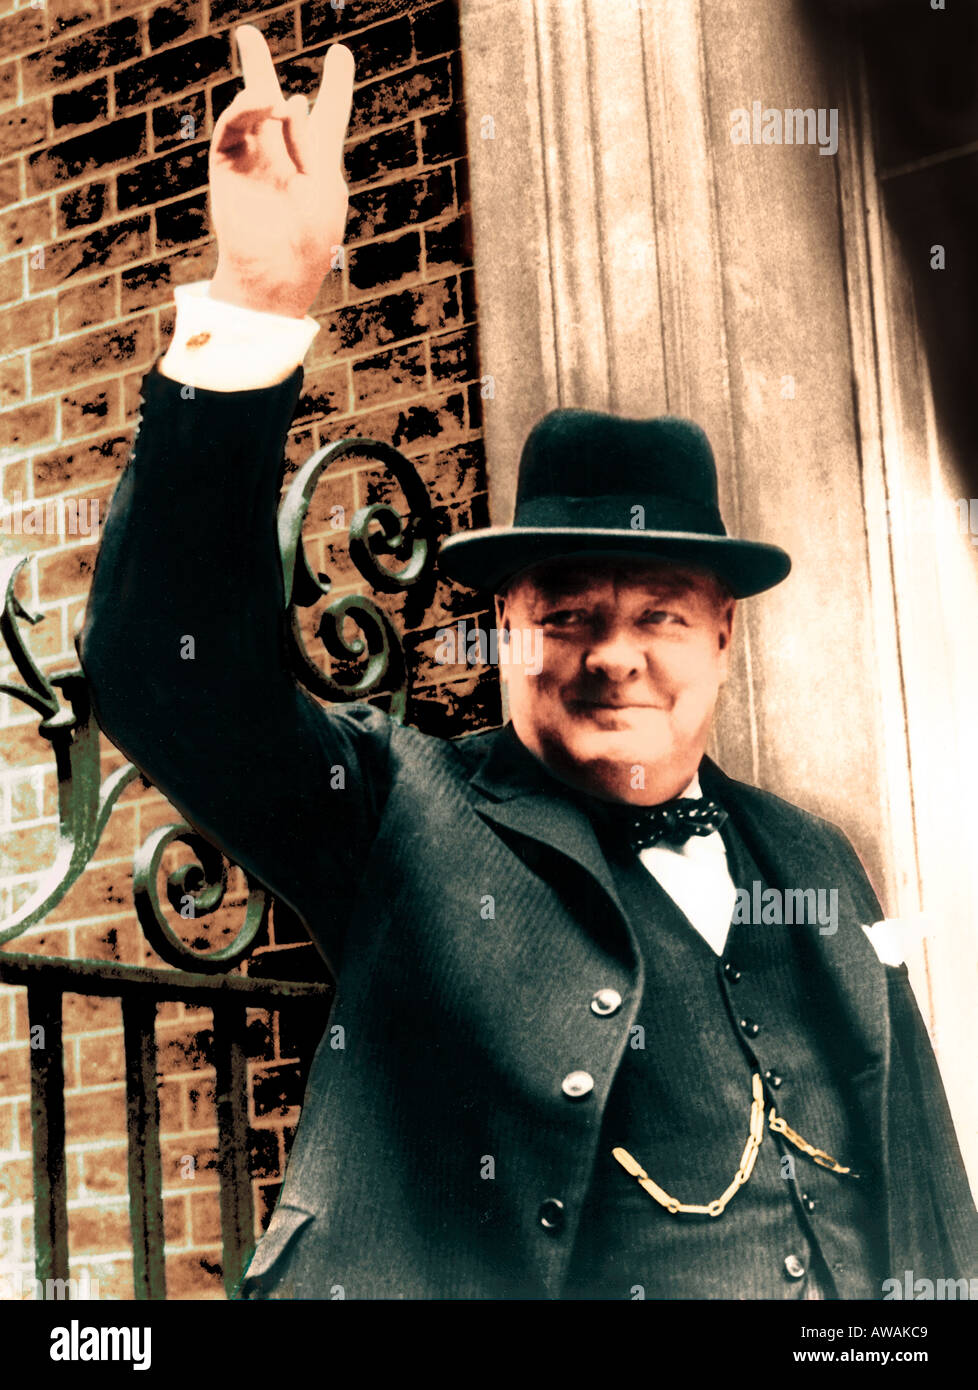 WINSTON CHURCHILL (1874-1965), Primer Ministro británico da su signo de la V de la victoria en abril de 1945 Imagen De Stock